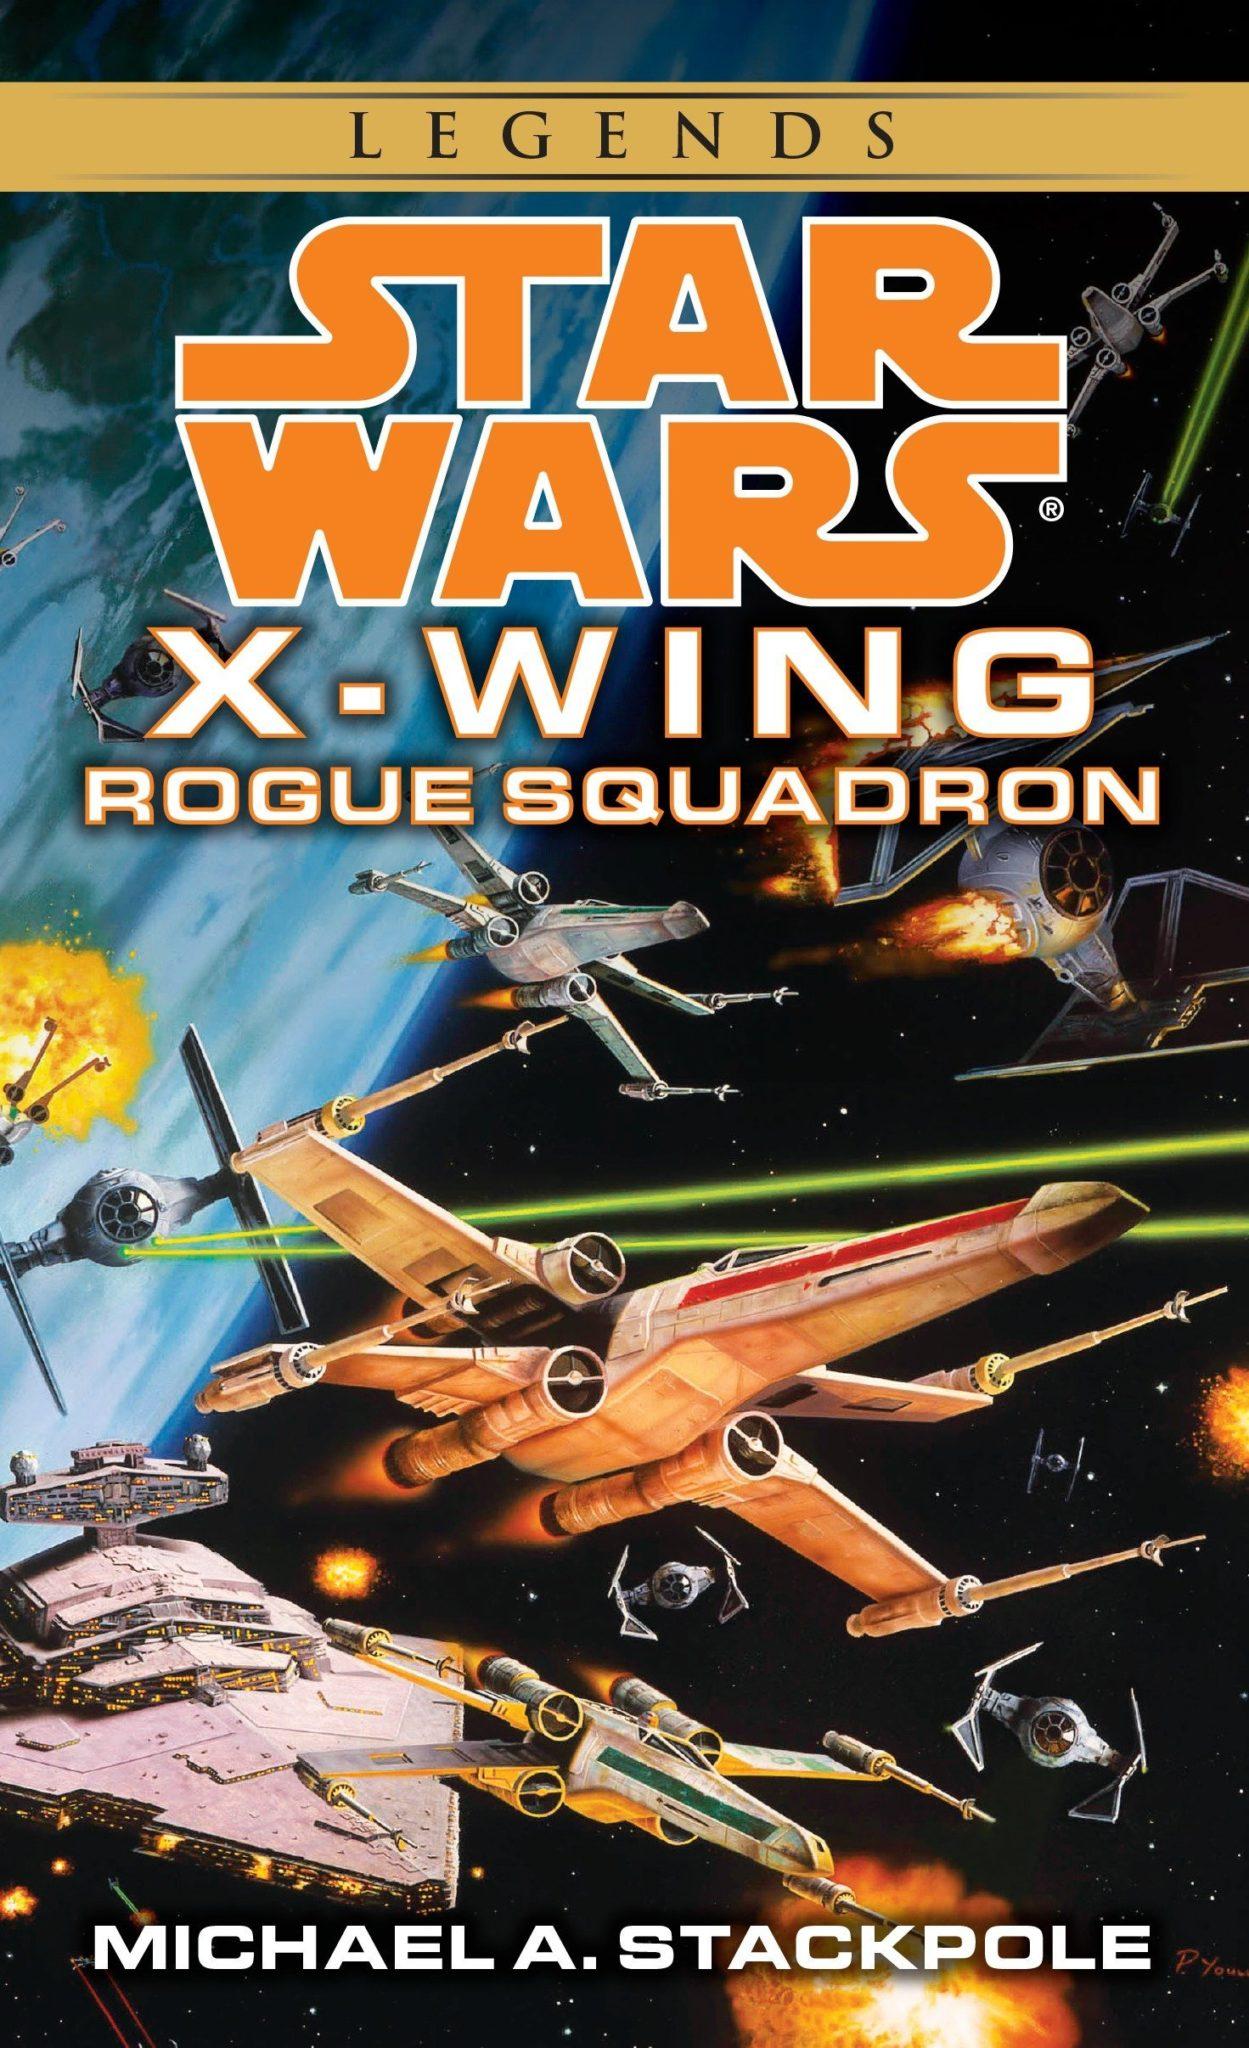 Star Wars books 9